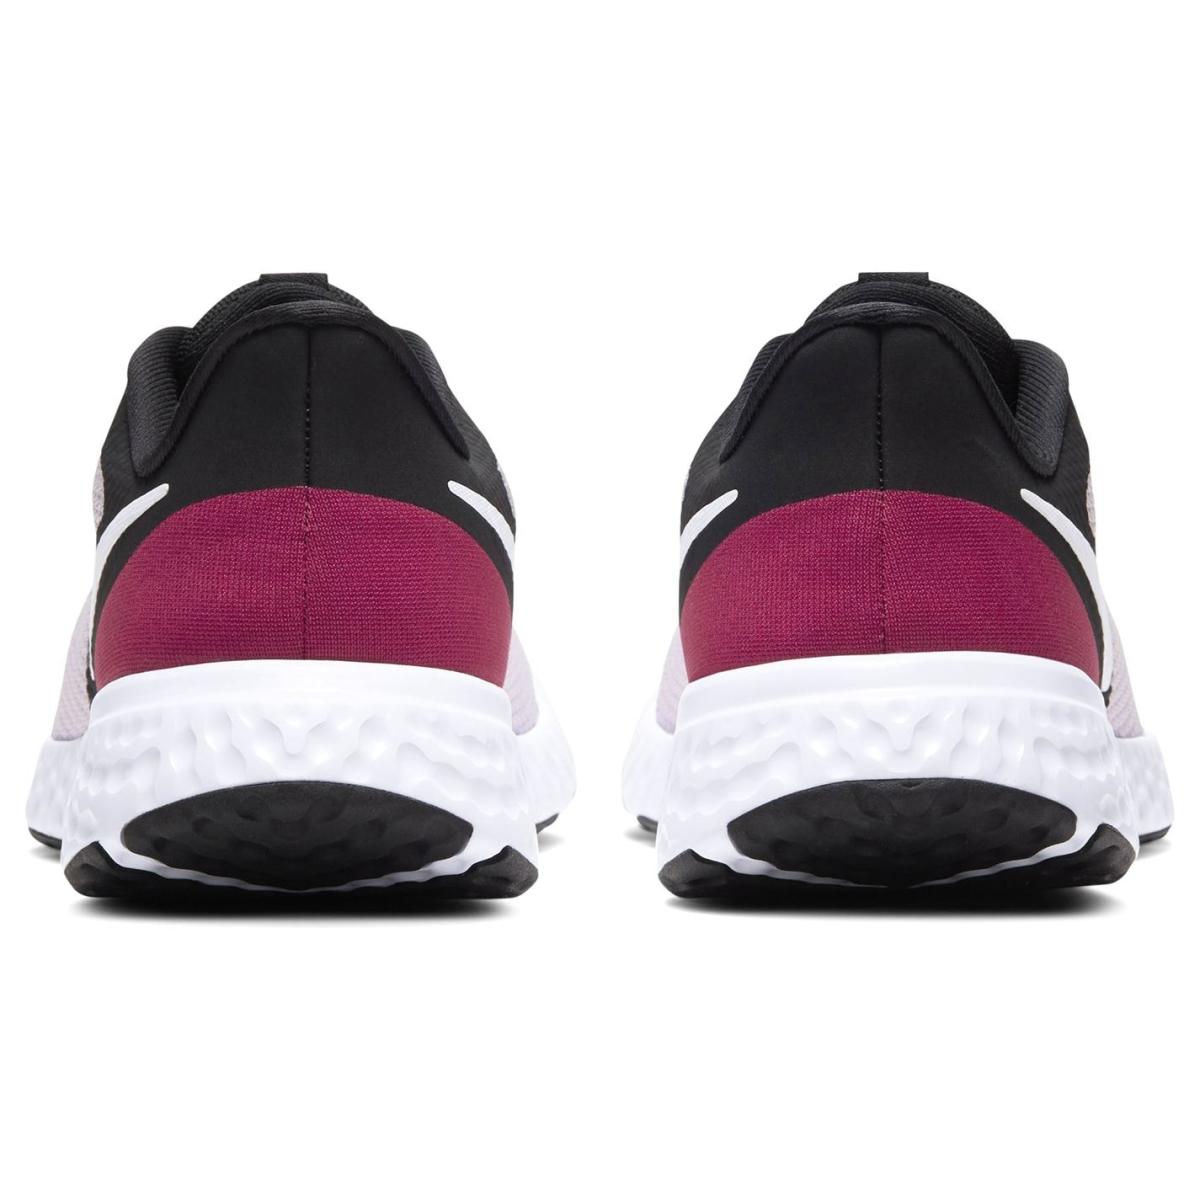 Nike-Revolution-Turnschuhe-Damen-Sneaker-Sportschuhe-Laufschuhe-1160 Indexbild 39